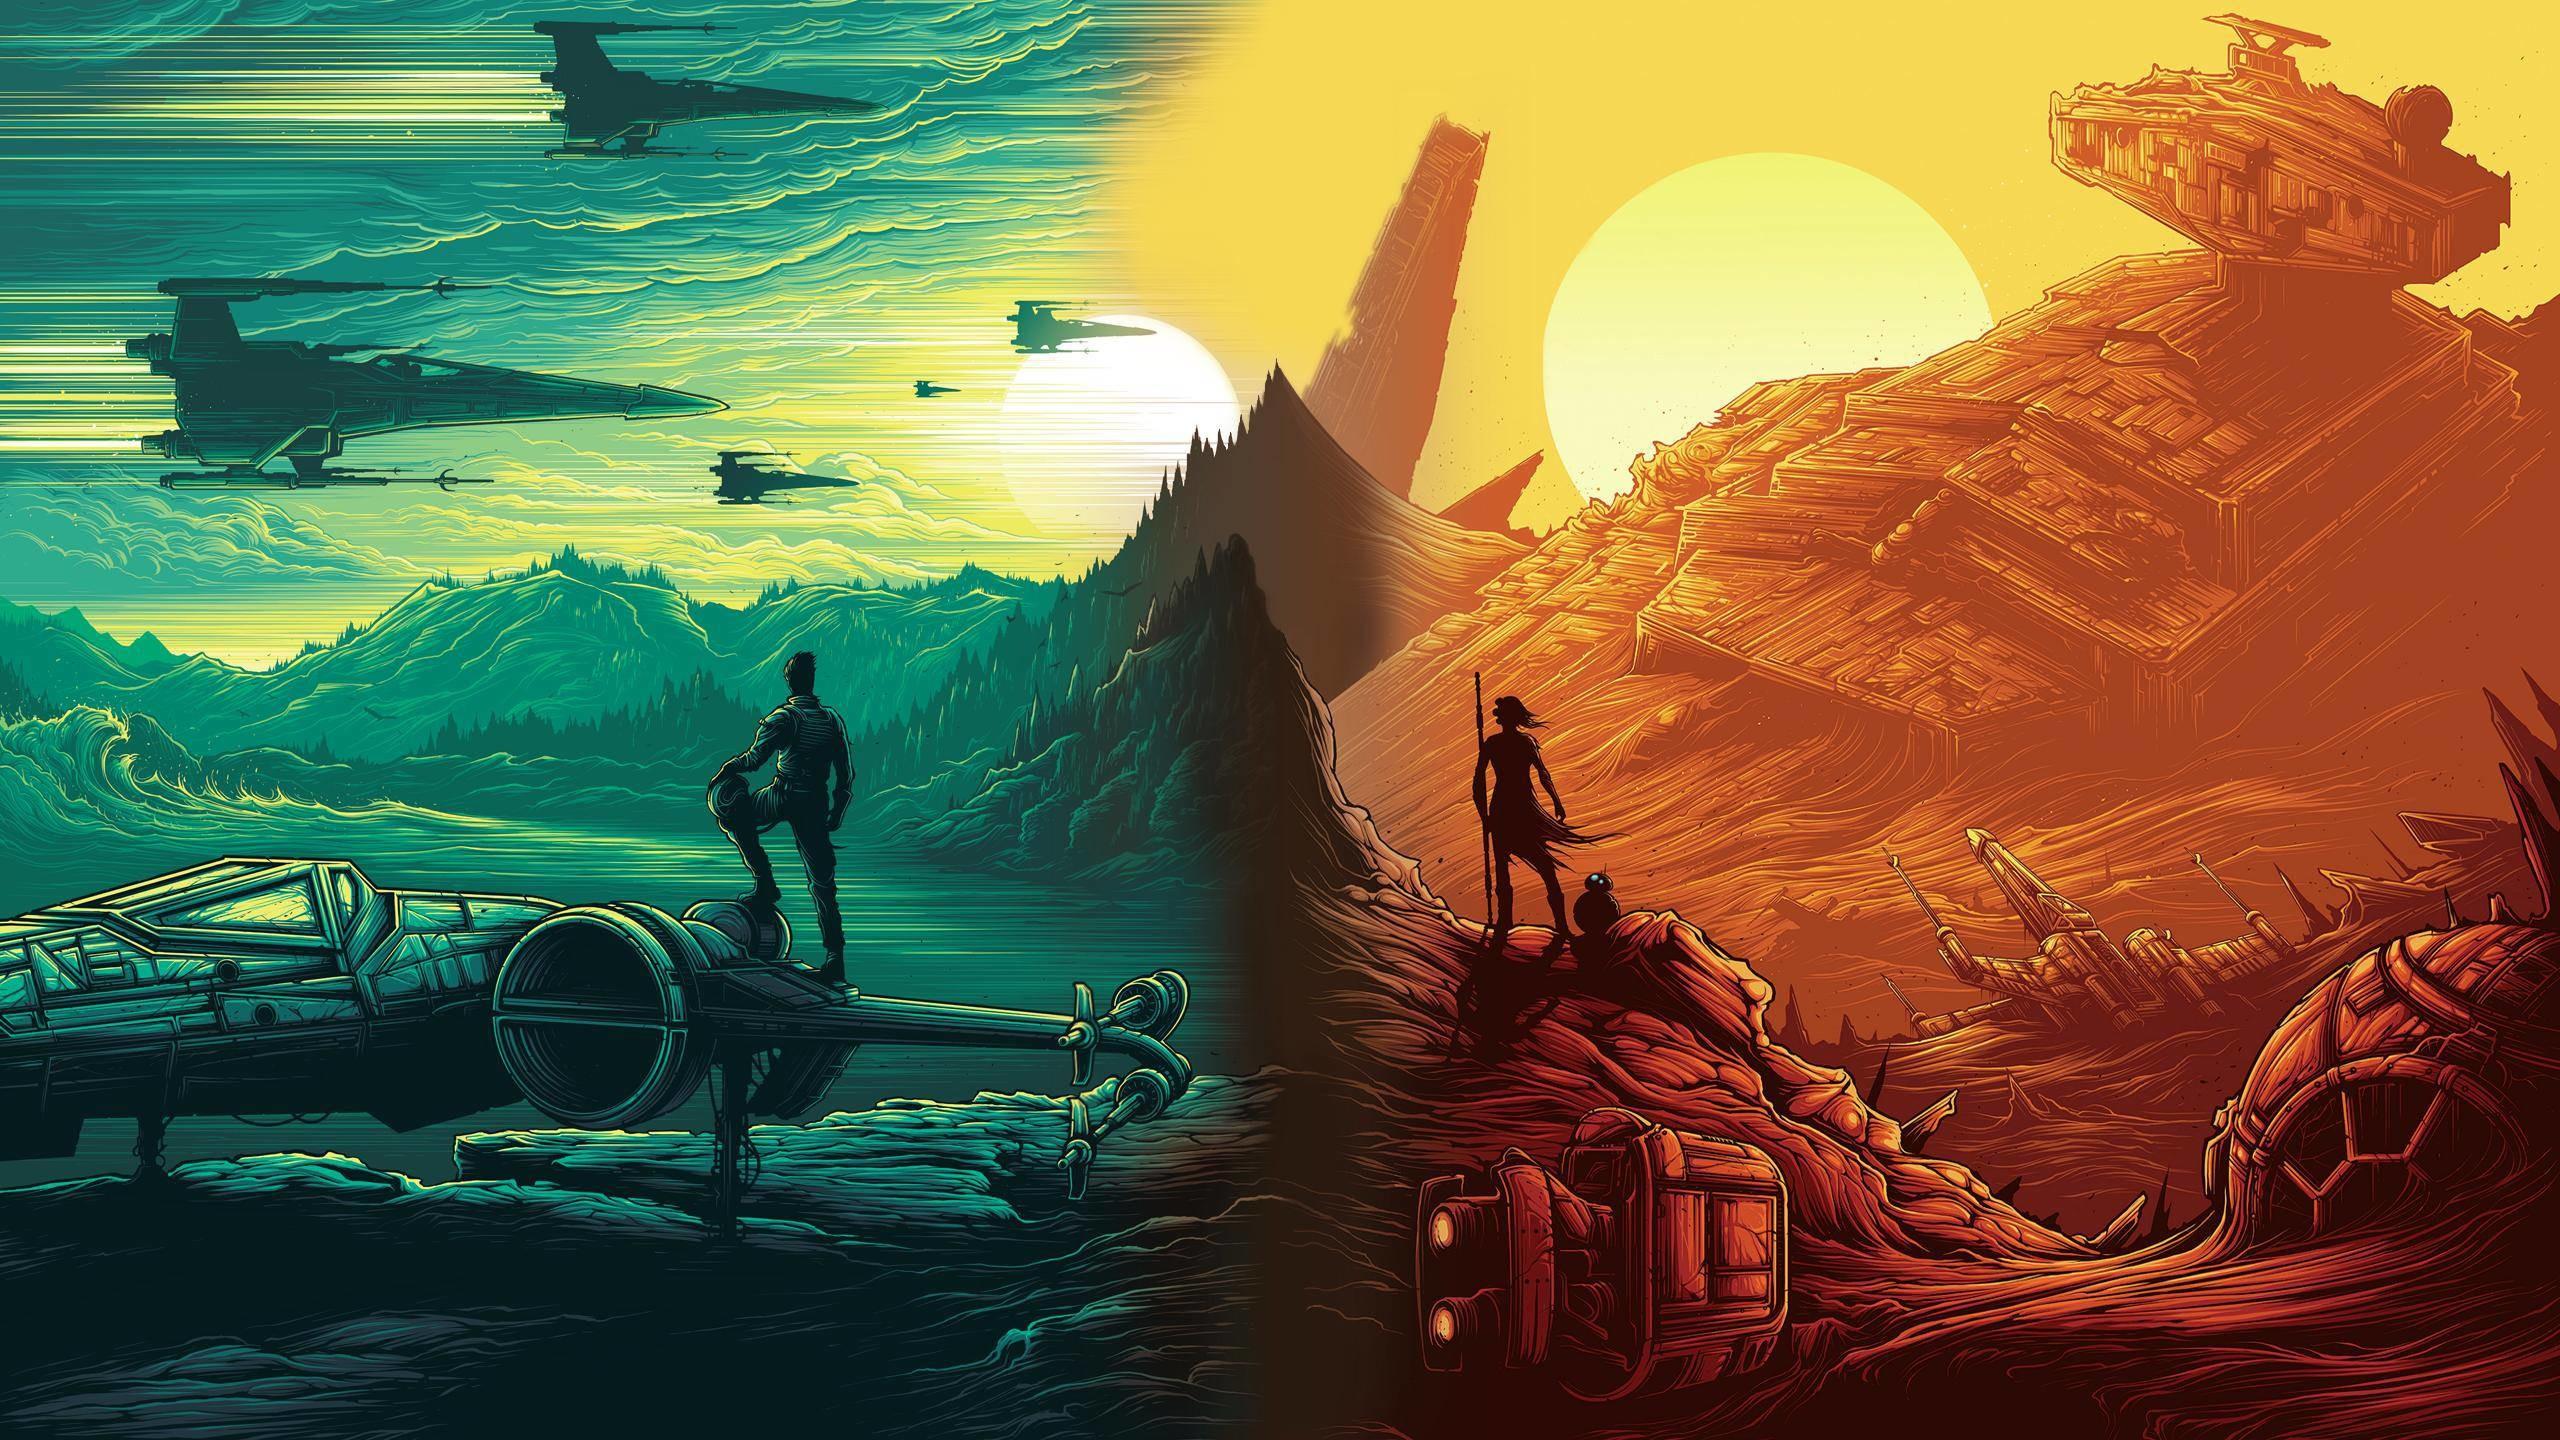 Star Wars Wallpapers Images For Desktop Wallpaper 2560 x 1440 px 1.08 MB  force return clone